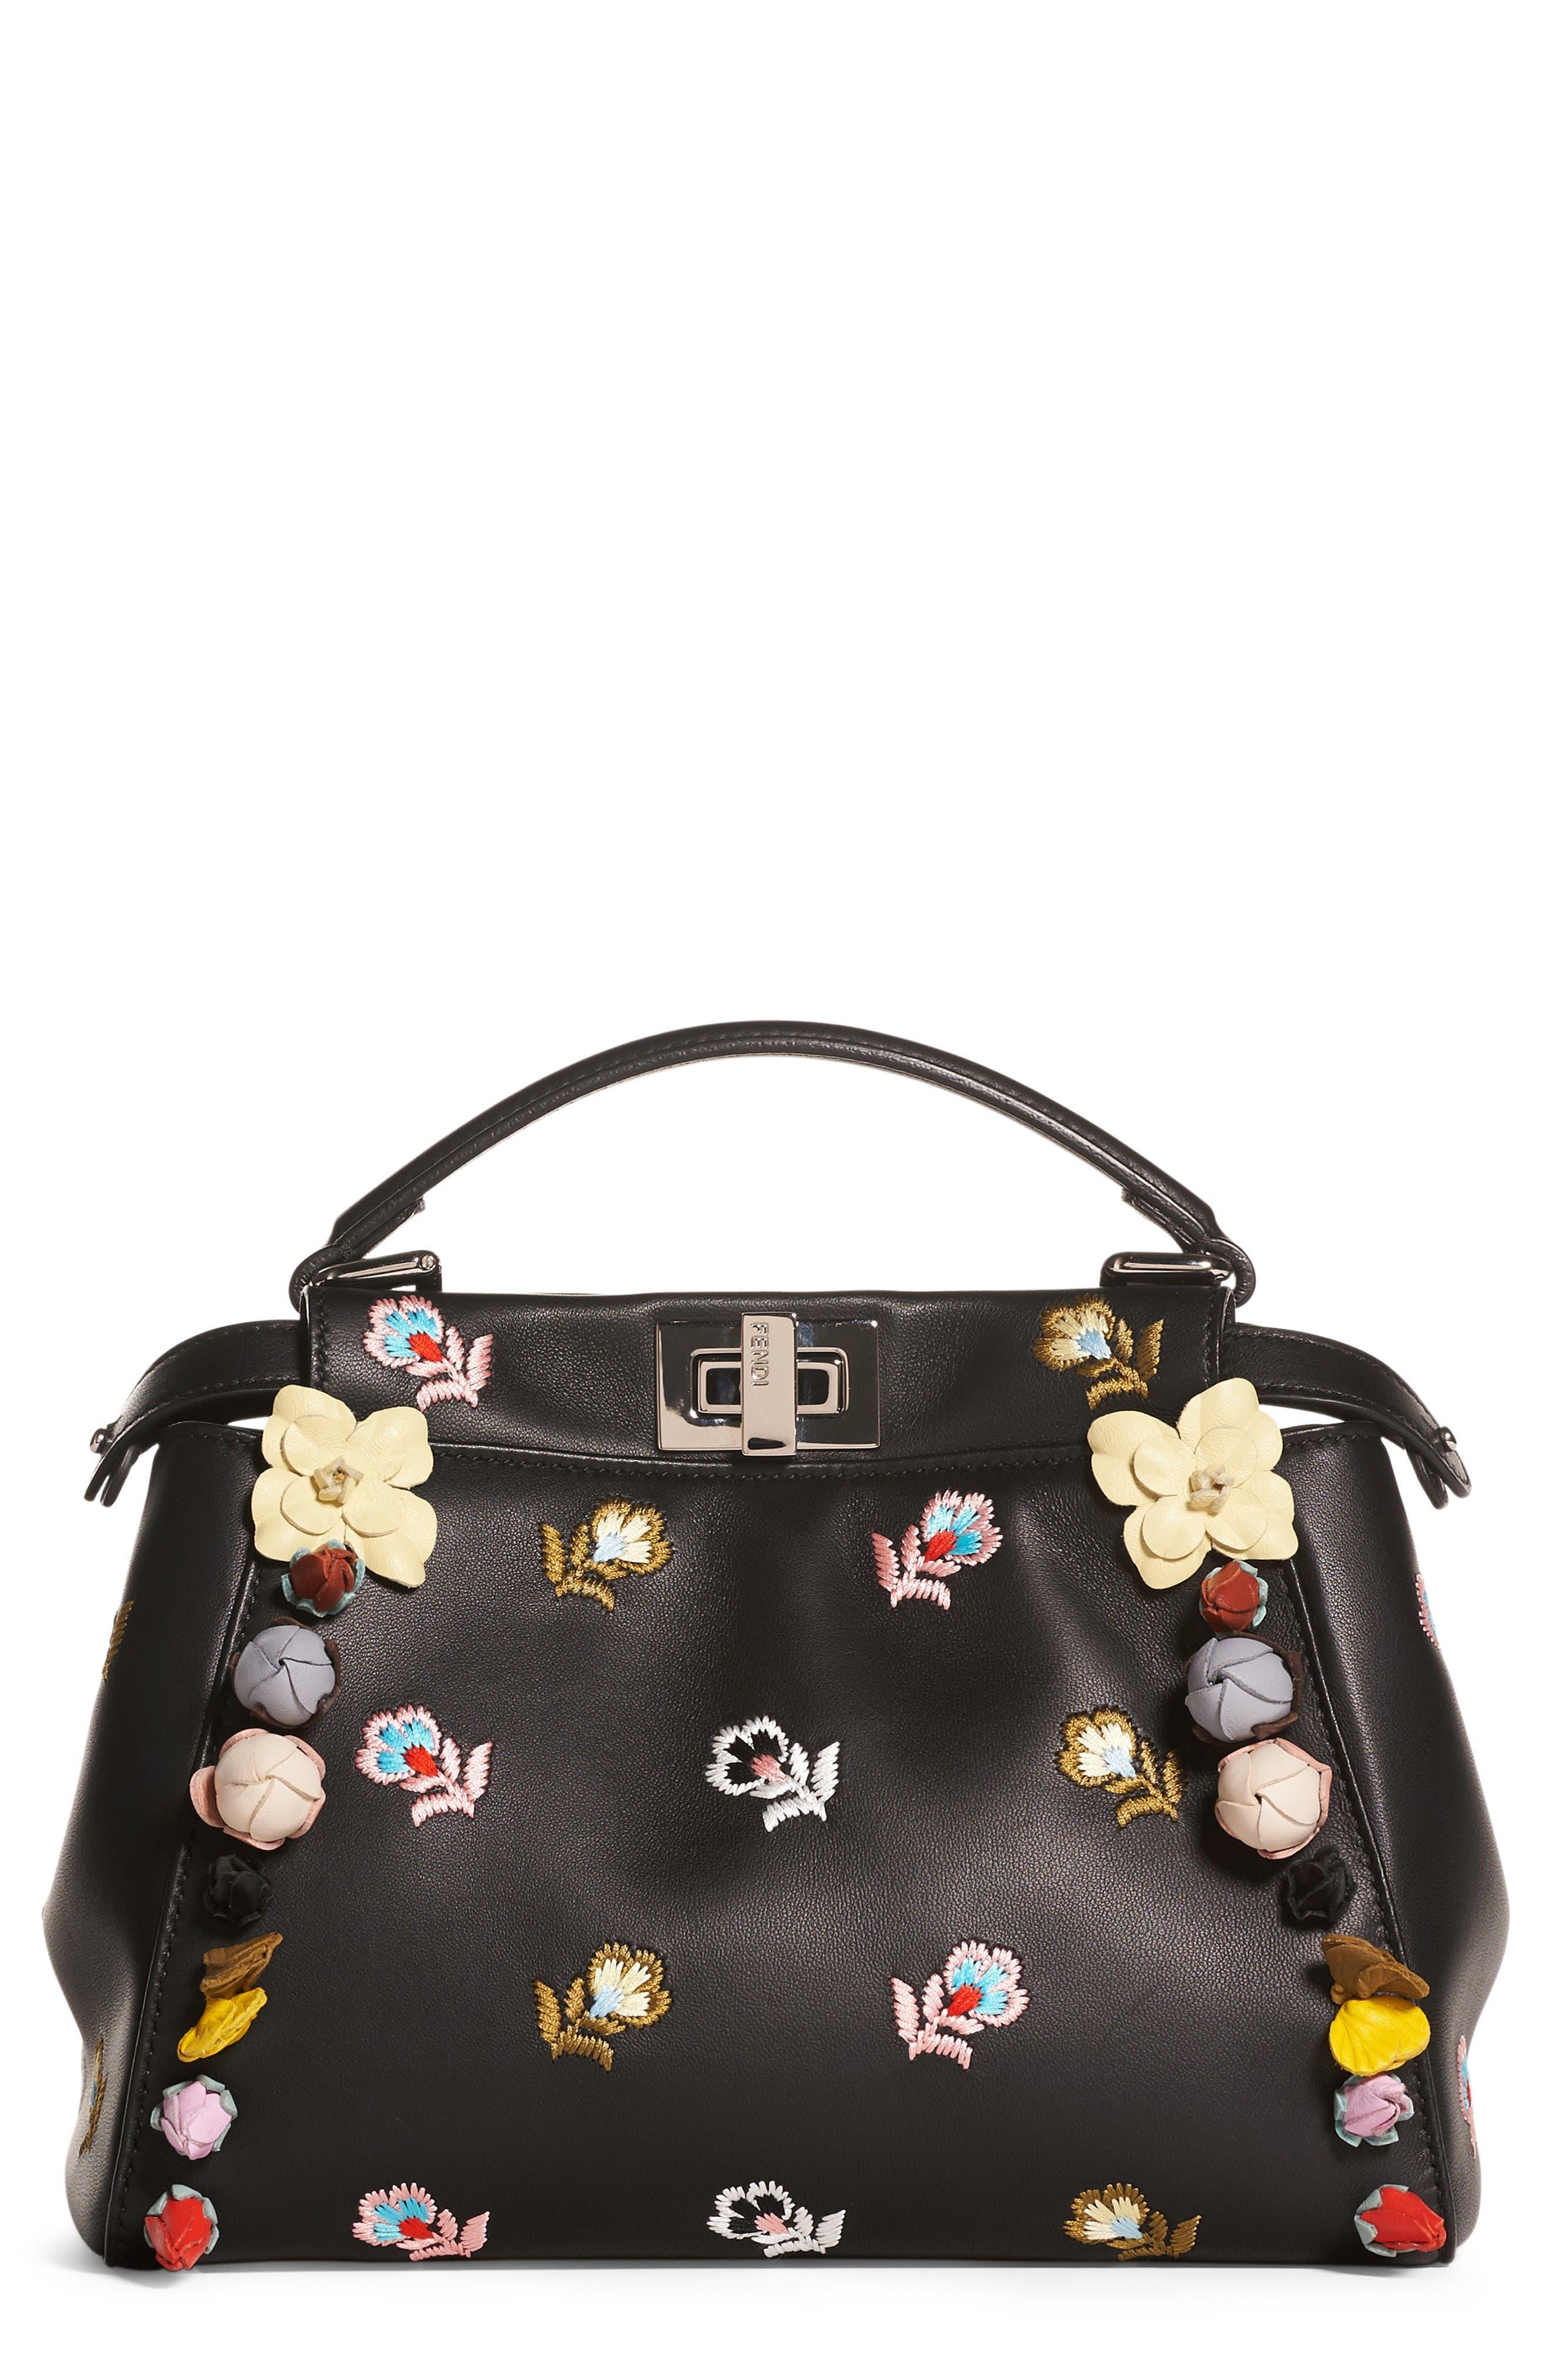 Alternate Image 1 Selected - Fendi Mini Peekaboo Floral Appliqué Leather Satchel